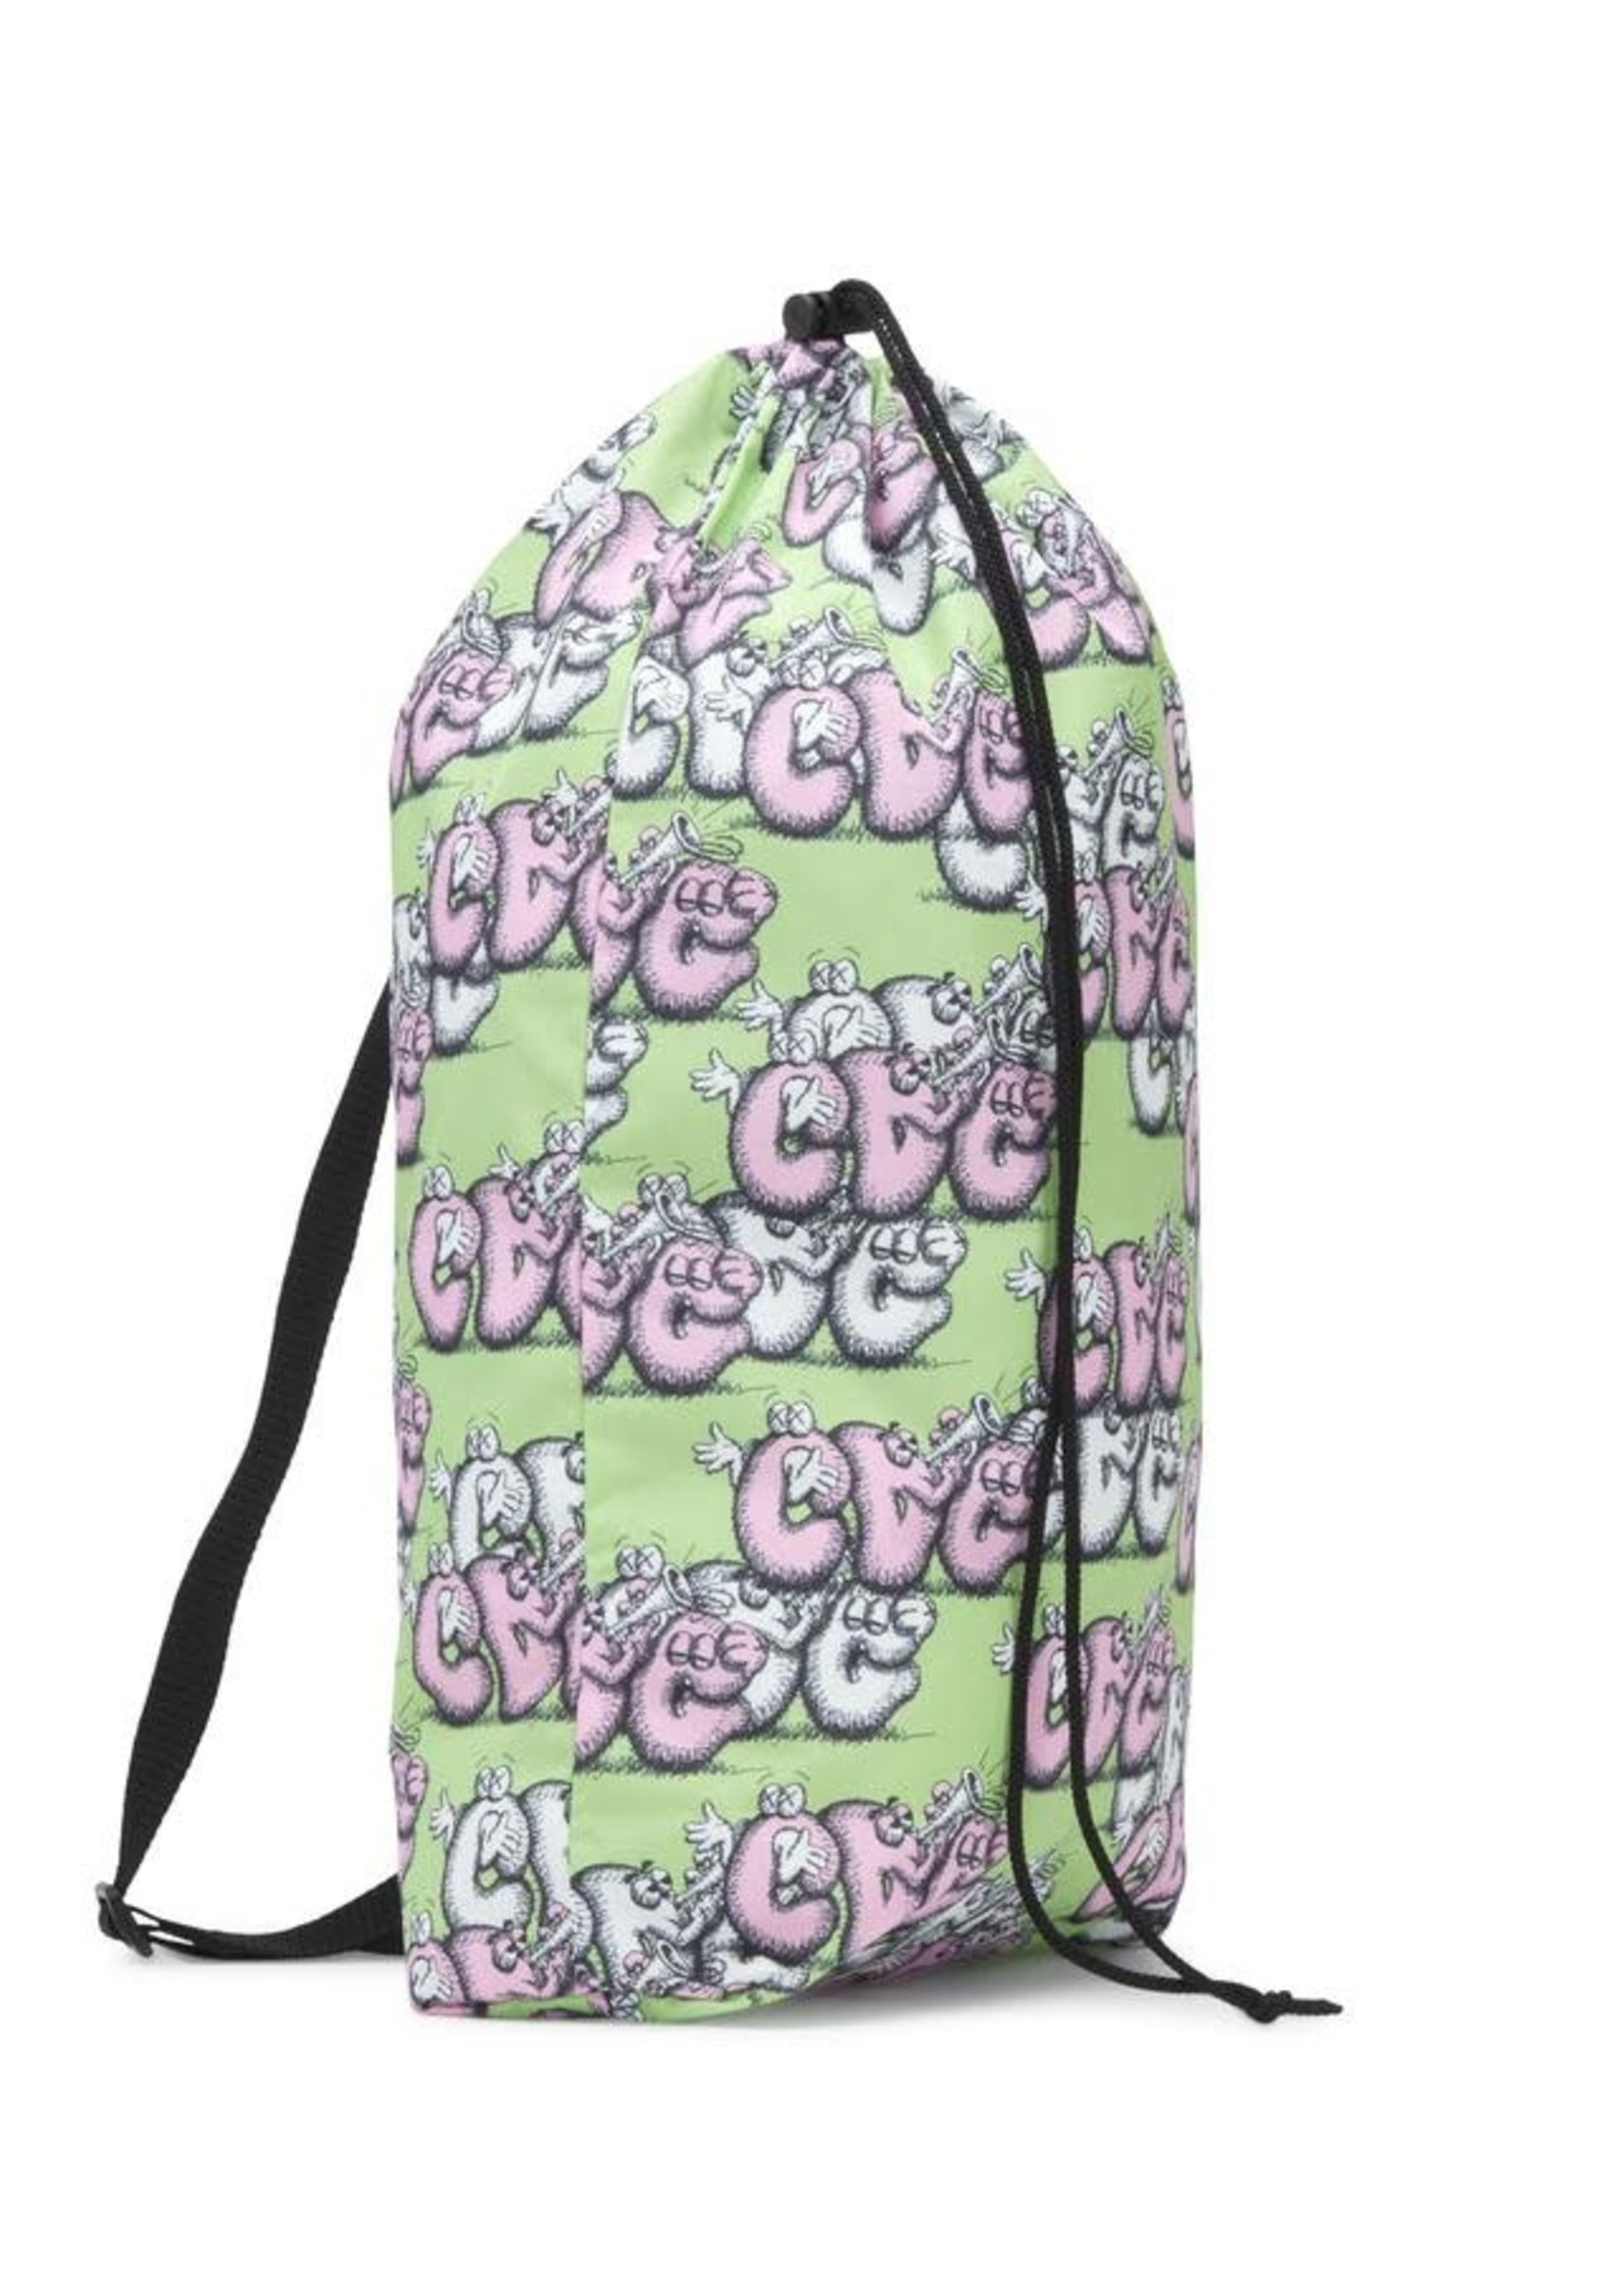 COMME des GARÇONS SHIRT CDG X KAWS Bag in Green and Pink